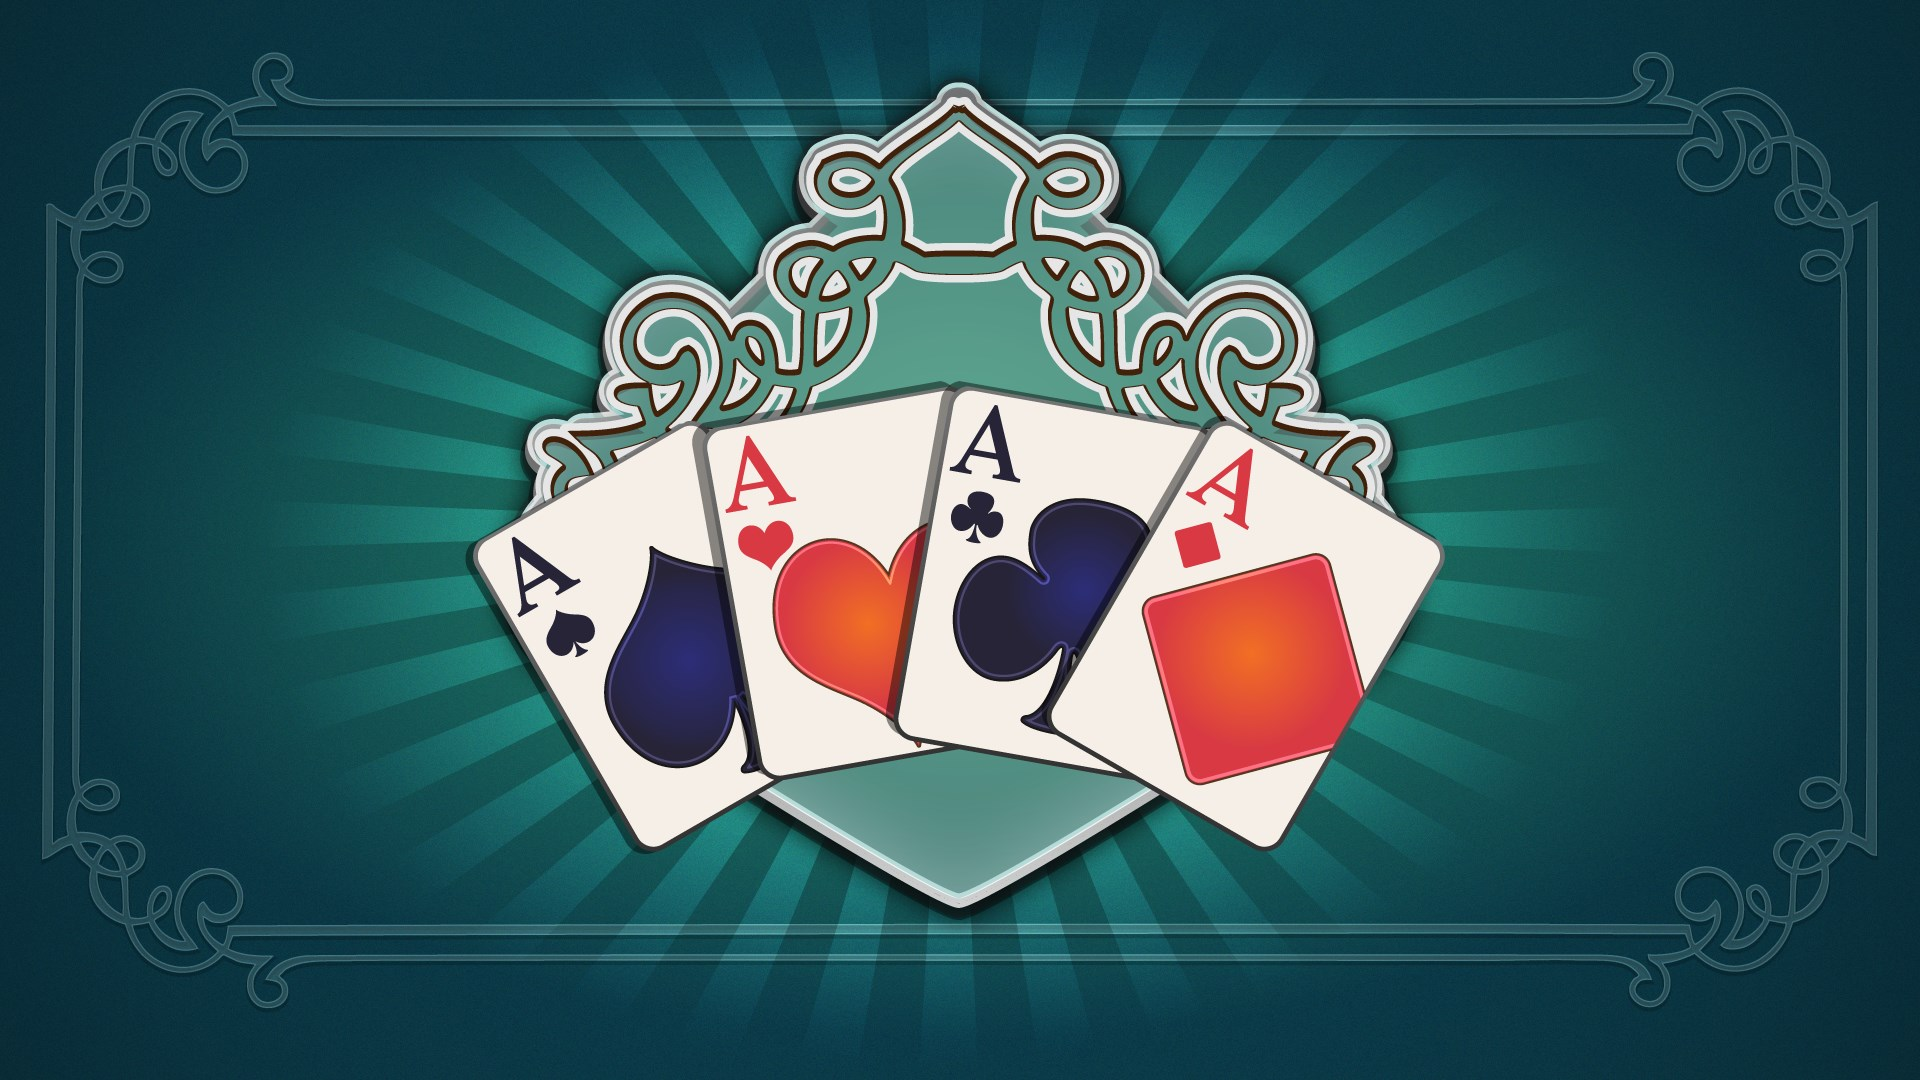 Card games gin rummy rules